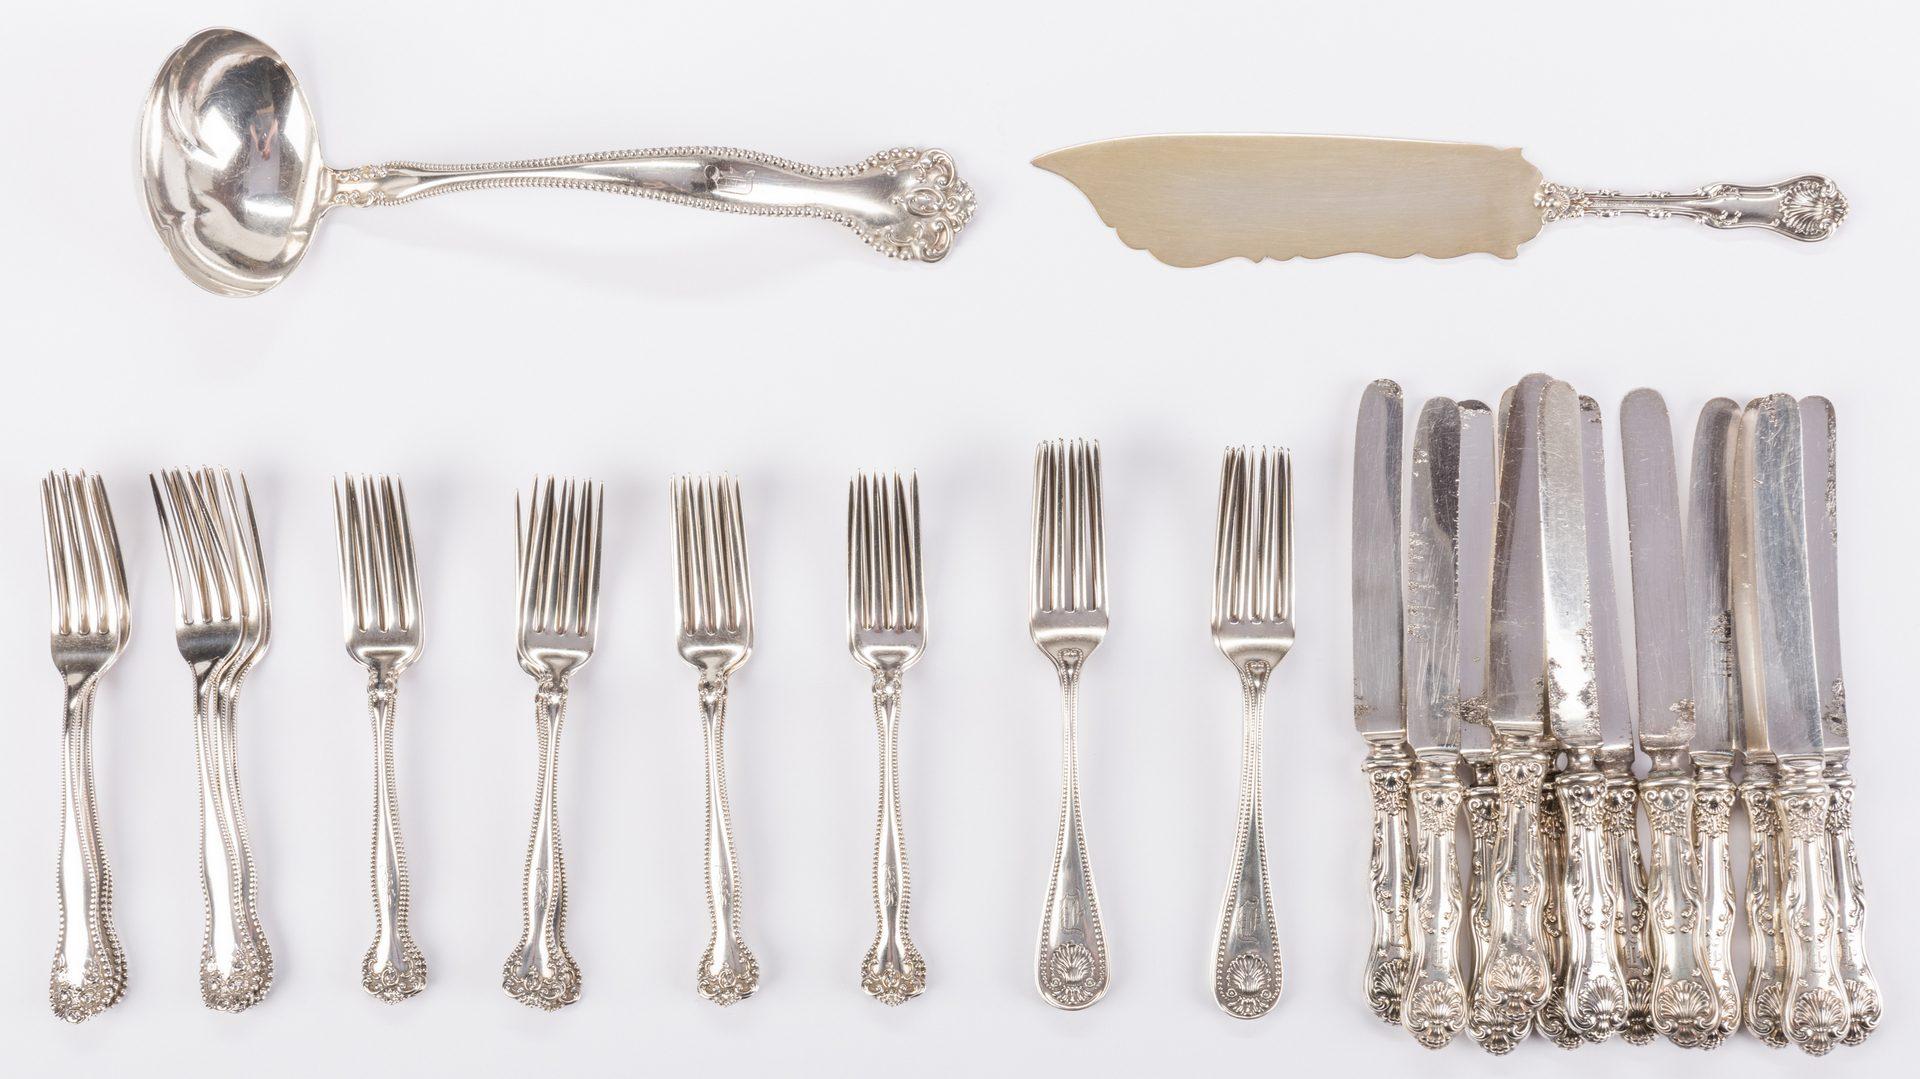 Lot 693: Vintage Sterling Flatware and Serving Pieces, 38 pcs